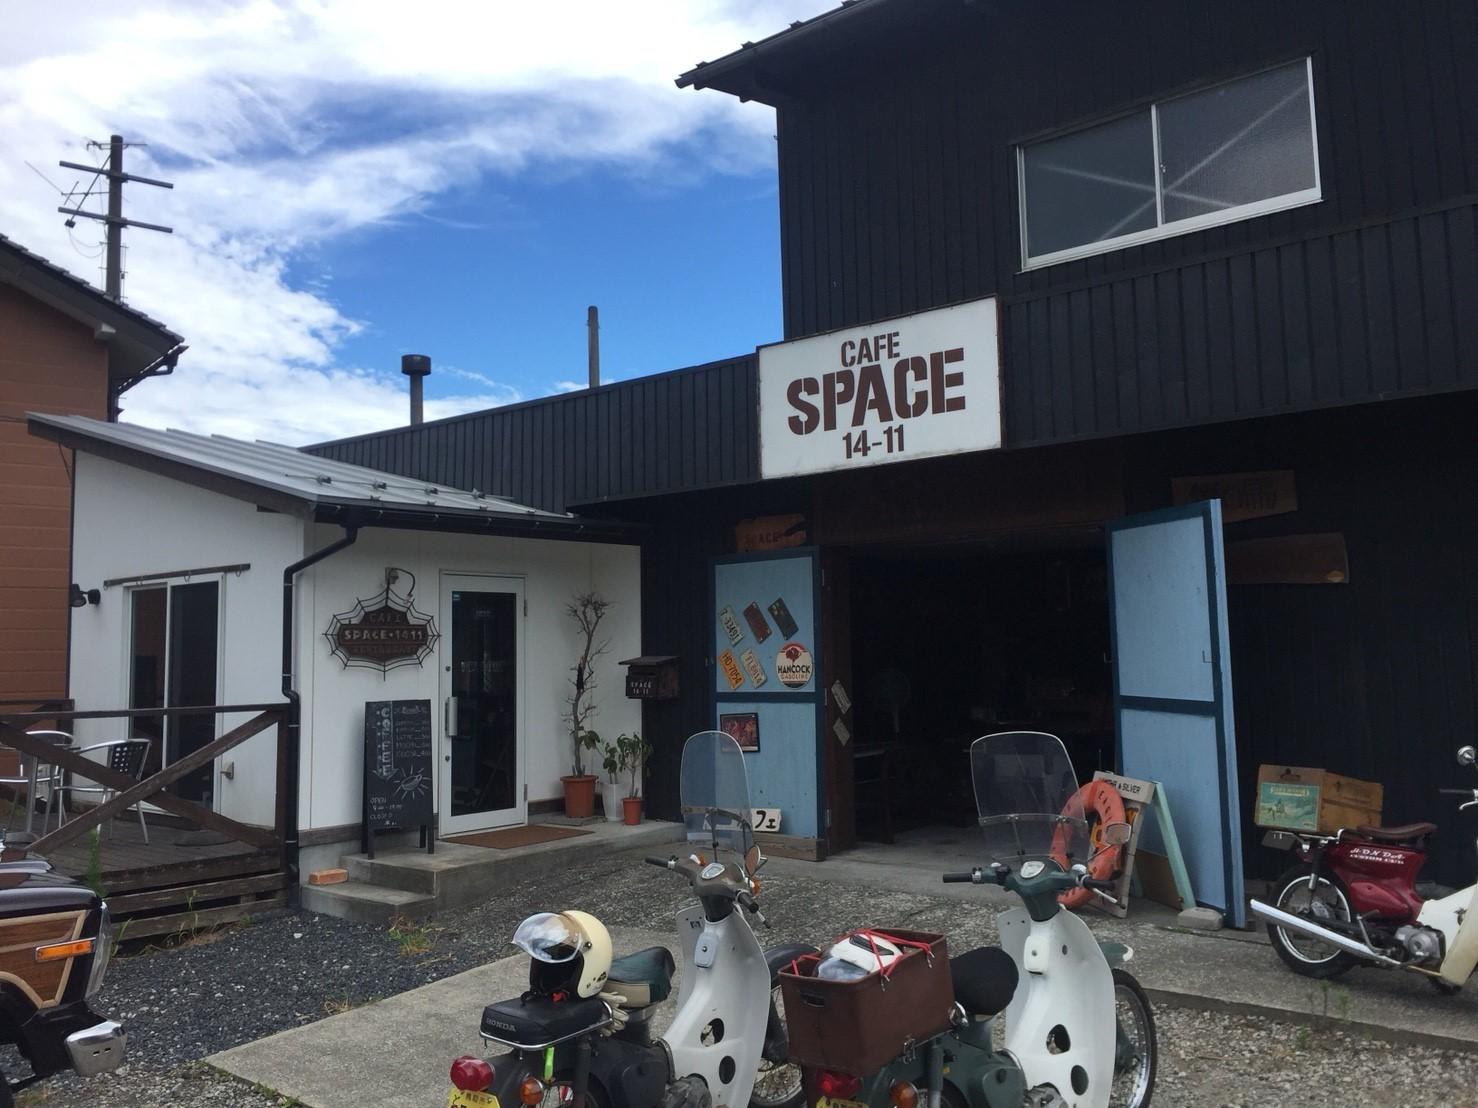 CAFE SPACE 14-11_e0115904_16241462.jpg